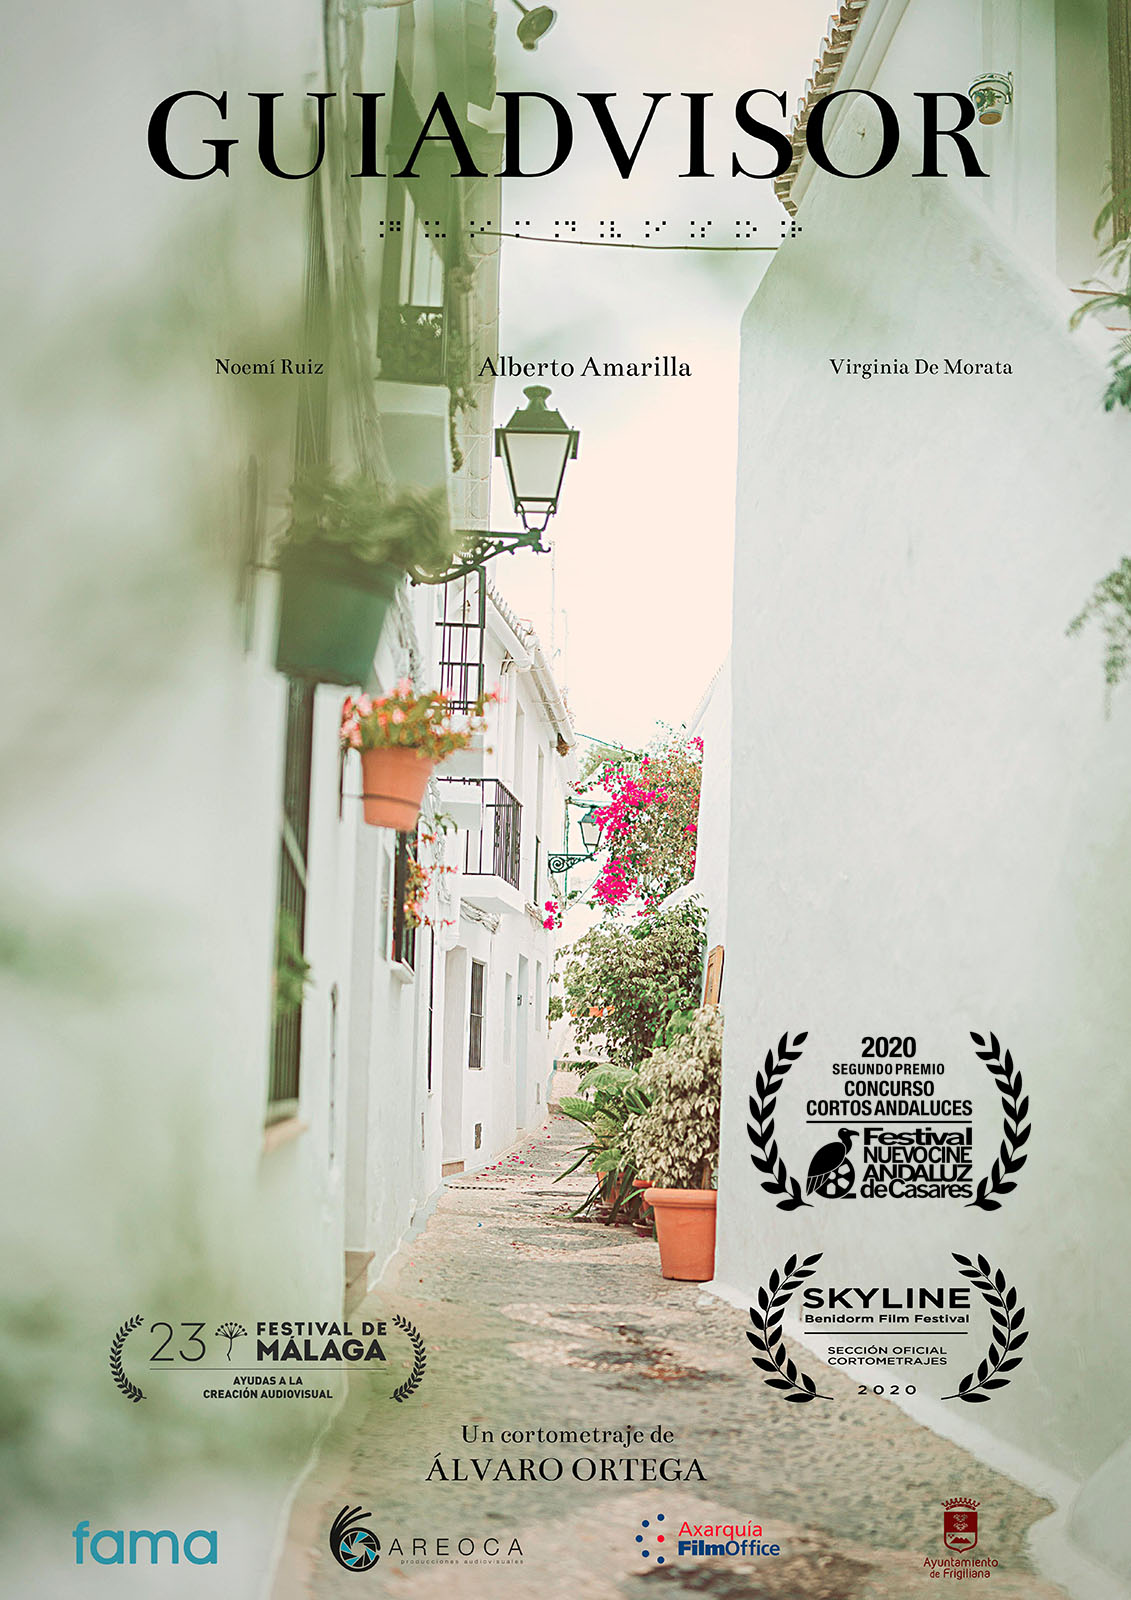 Guiadvisor, de Álvaro Ortega. Segundo Premio Concurso Cortos Andaluces Nuevo Cine Andaluz 2020